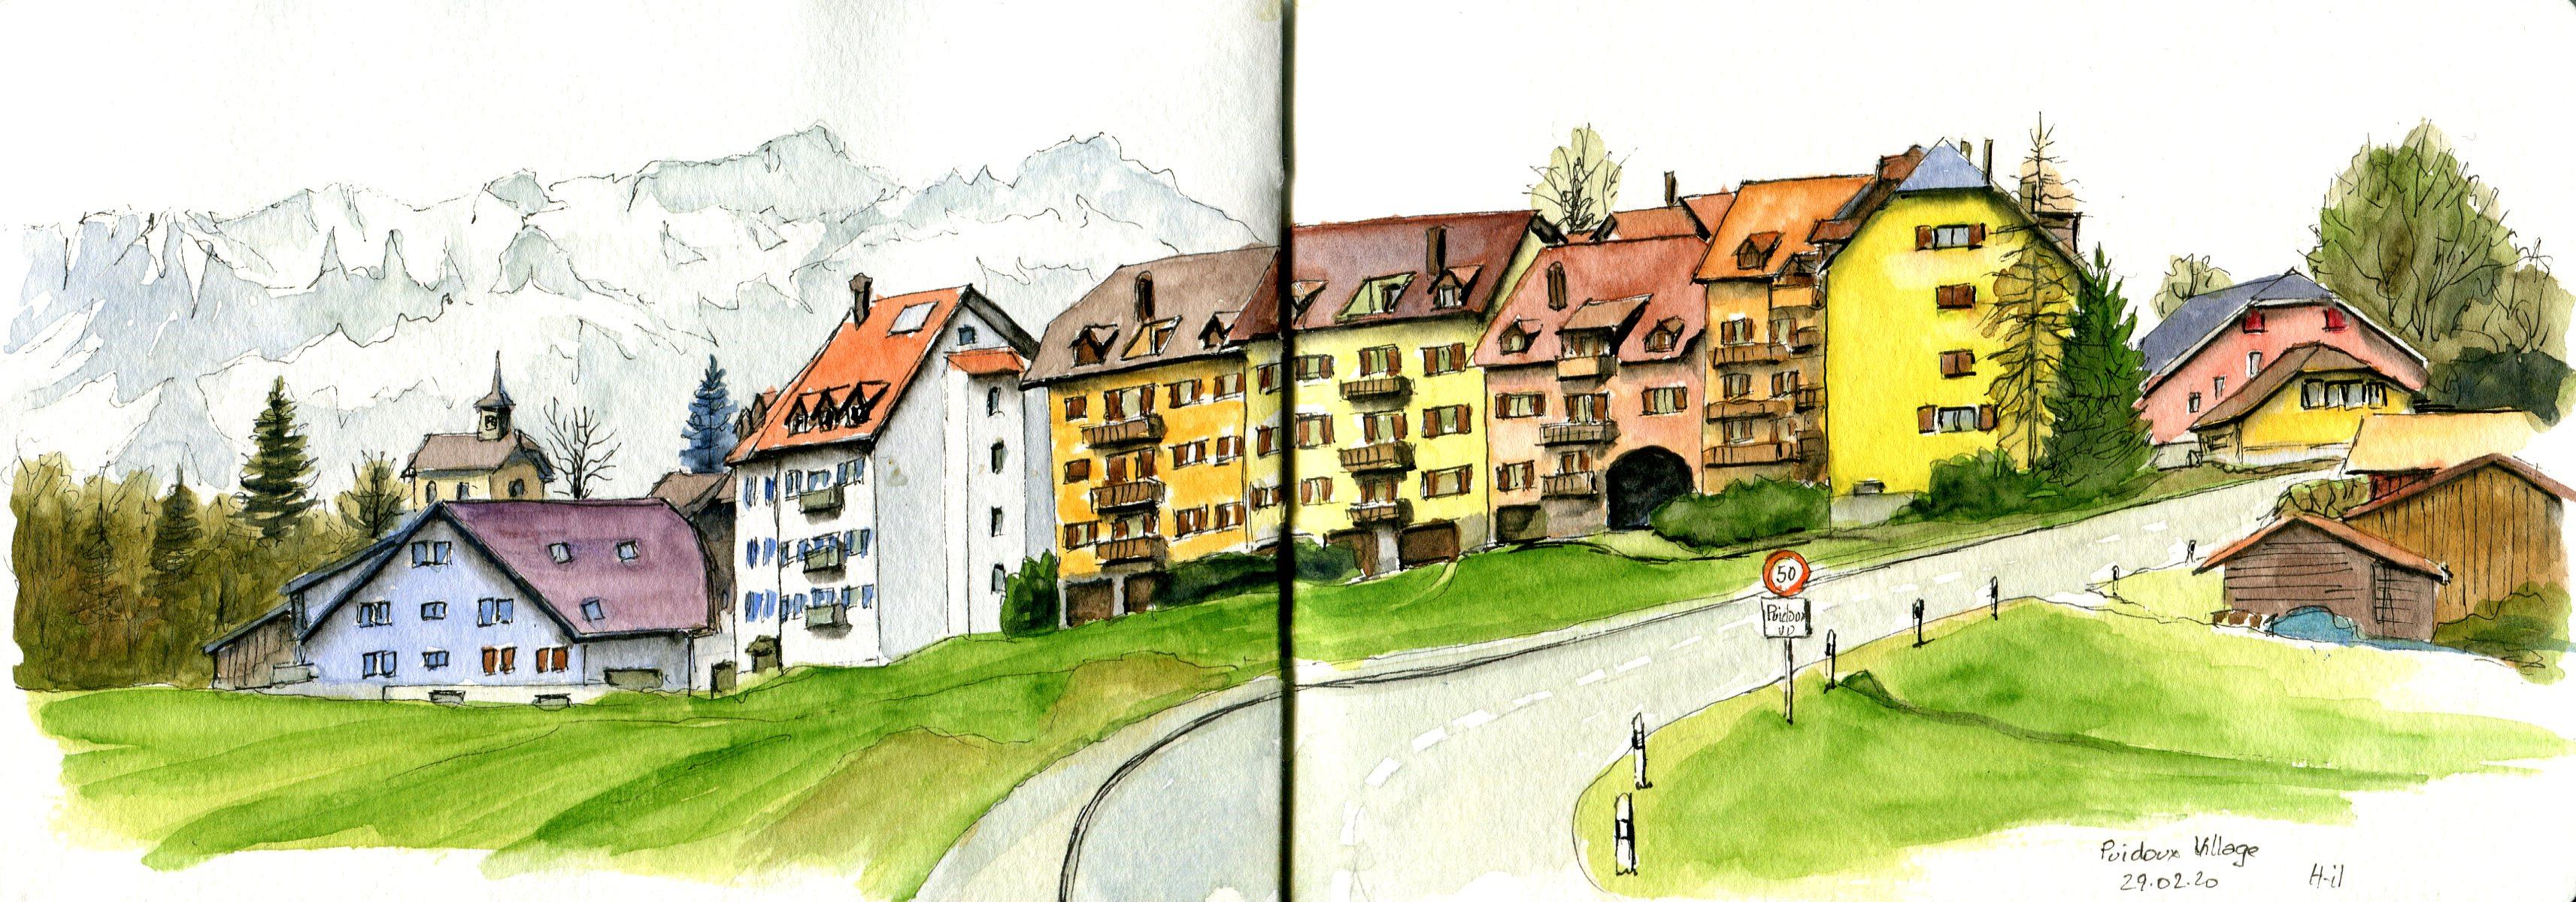 Puidoux Village122